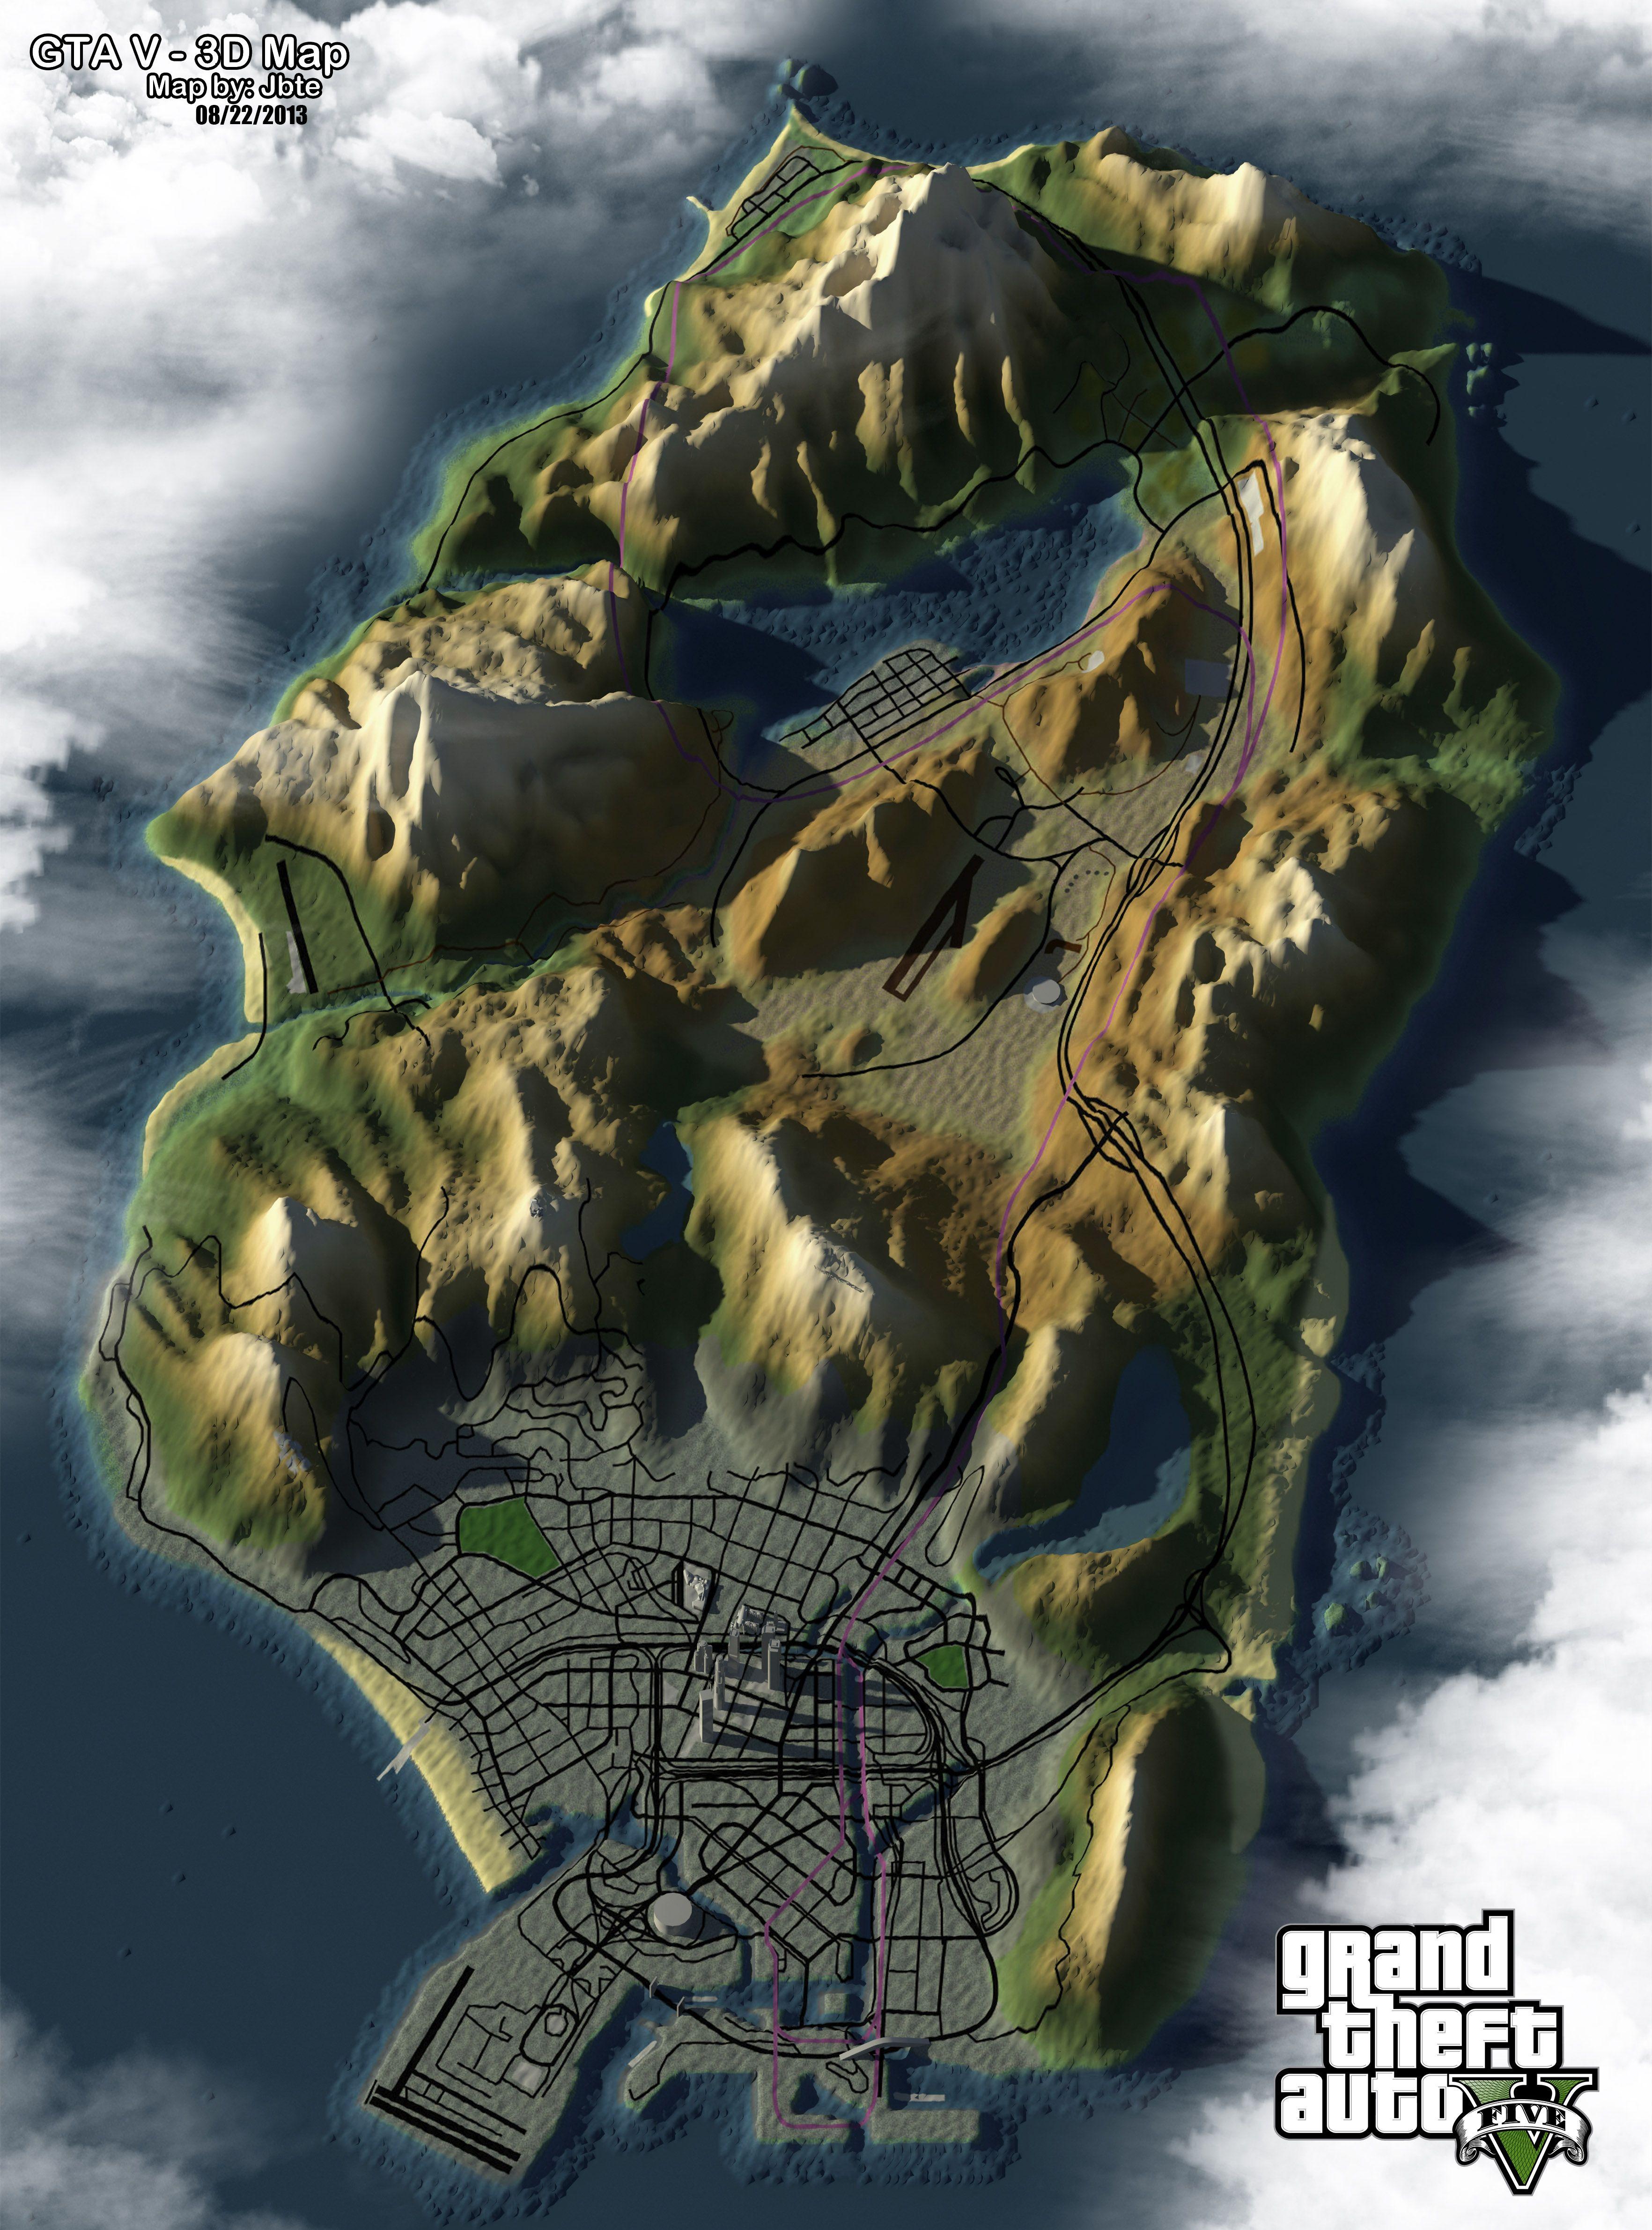 Topography of GTA V San Andreas | GTA | Gta, San,reas, Geek